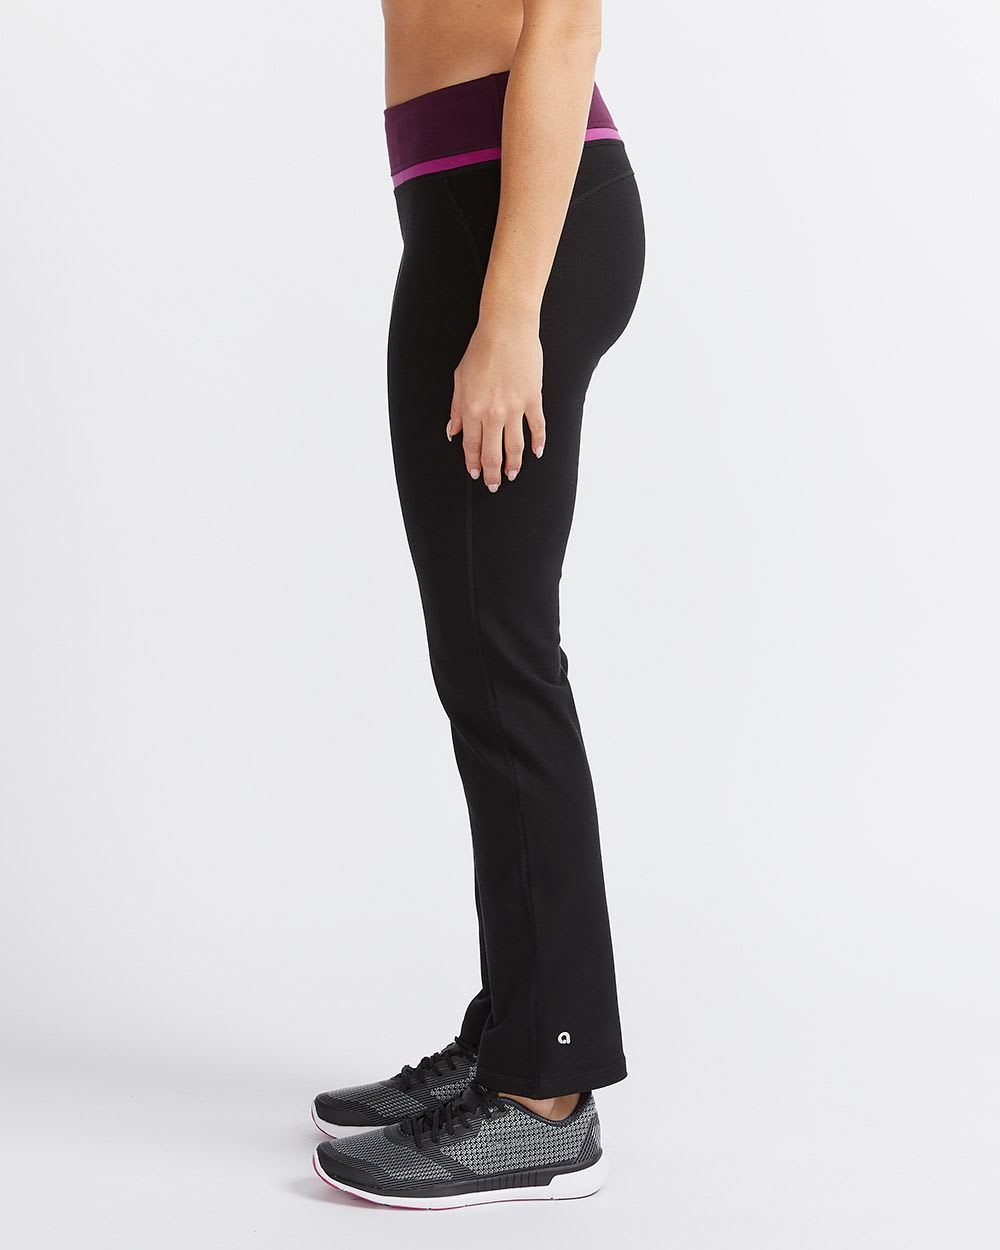 Hyba Colourblock Petite Pants